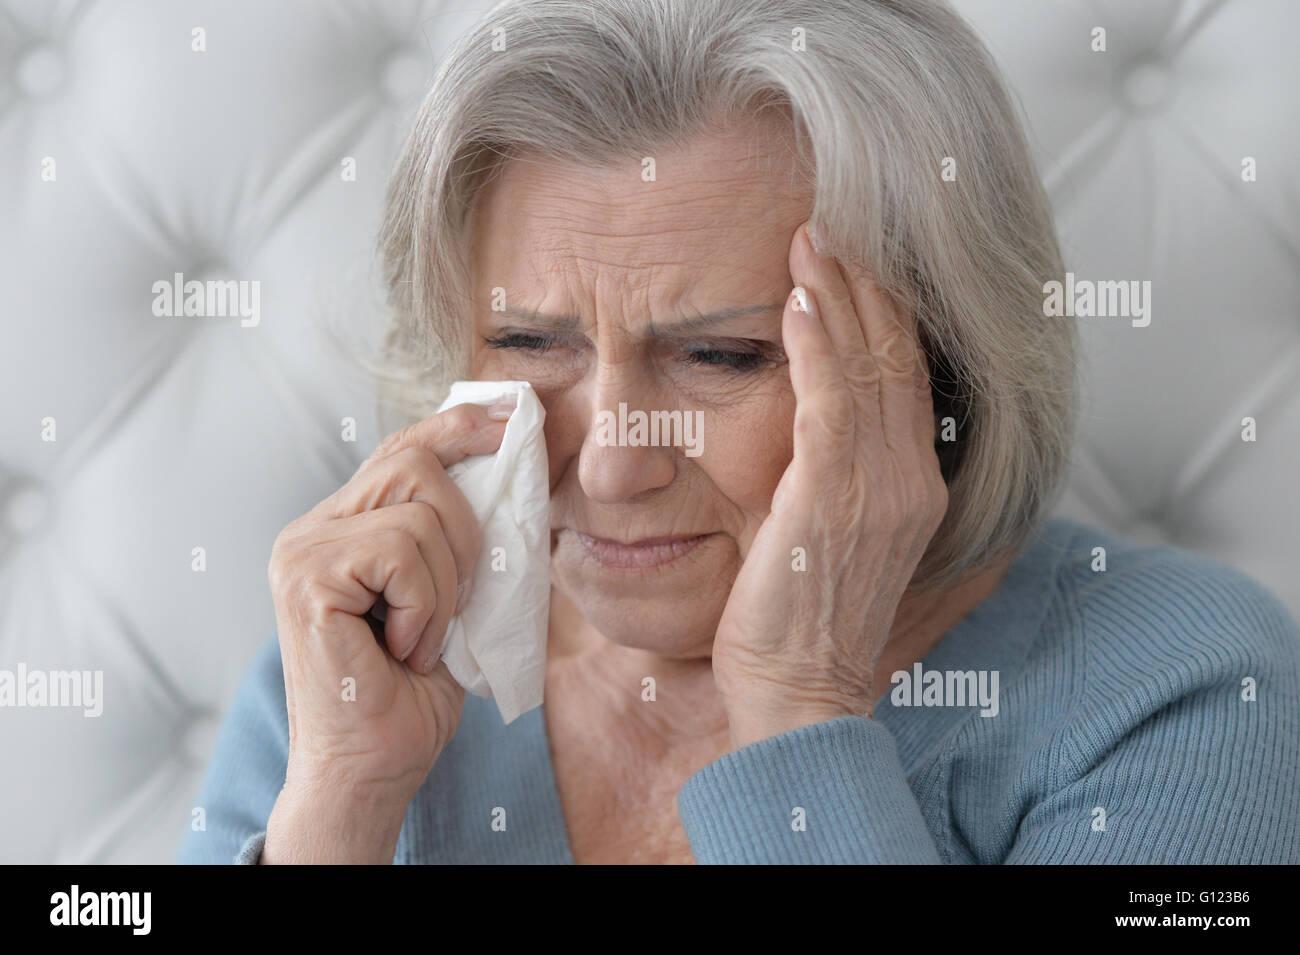 Senior woman portrait - Stock Image